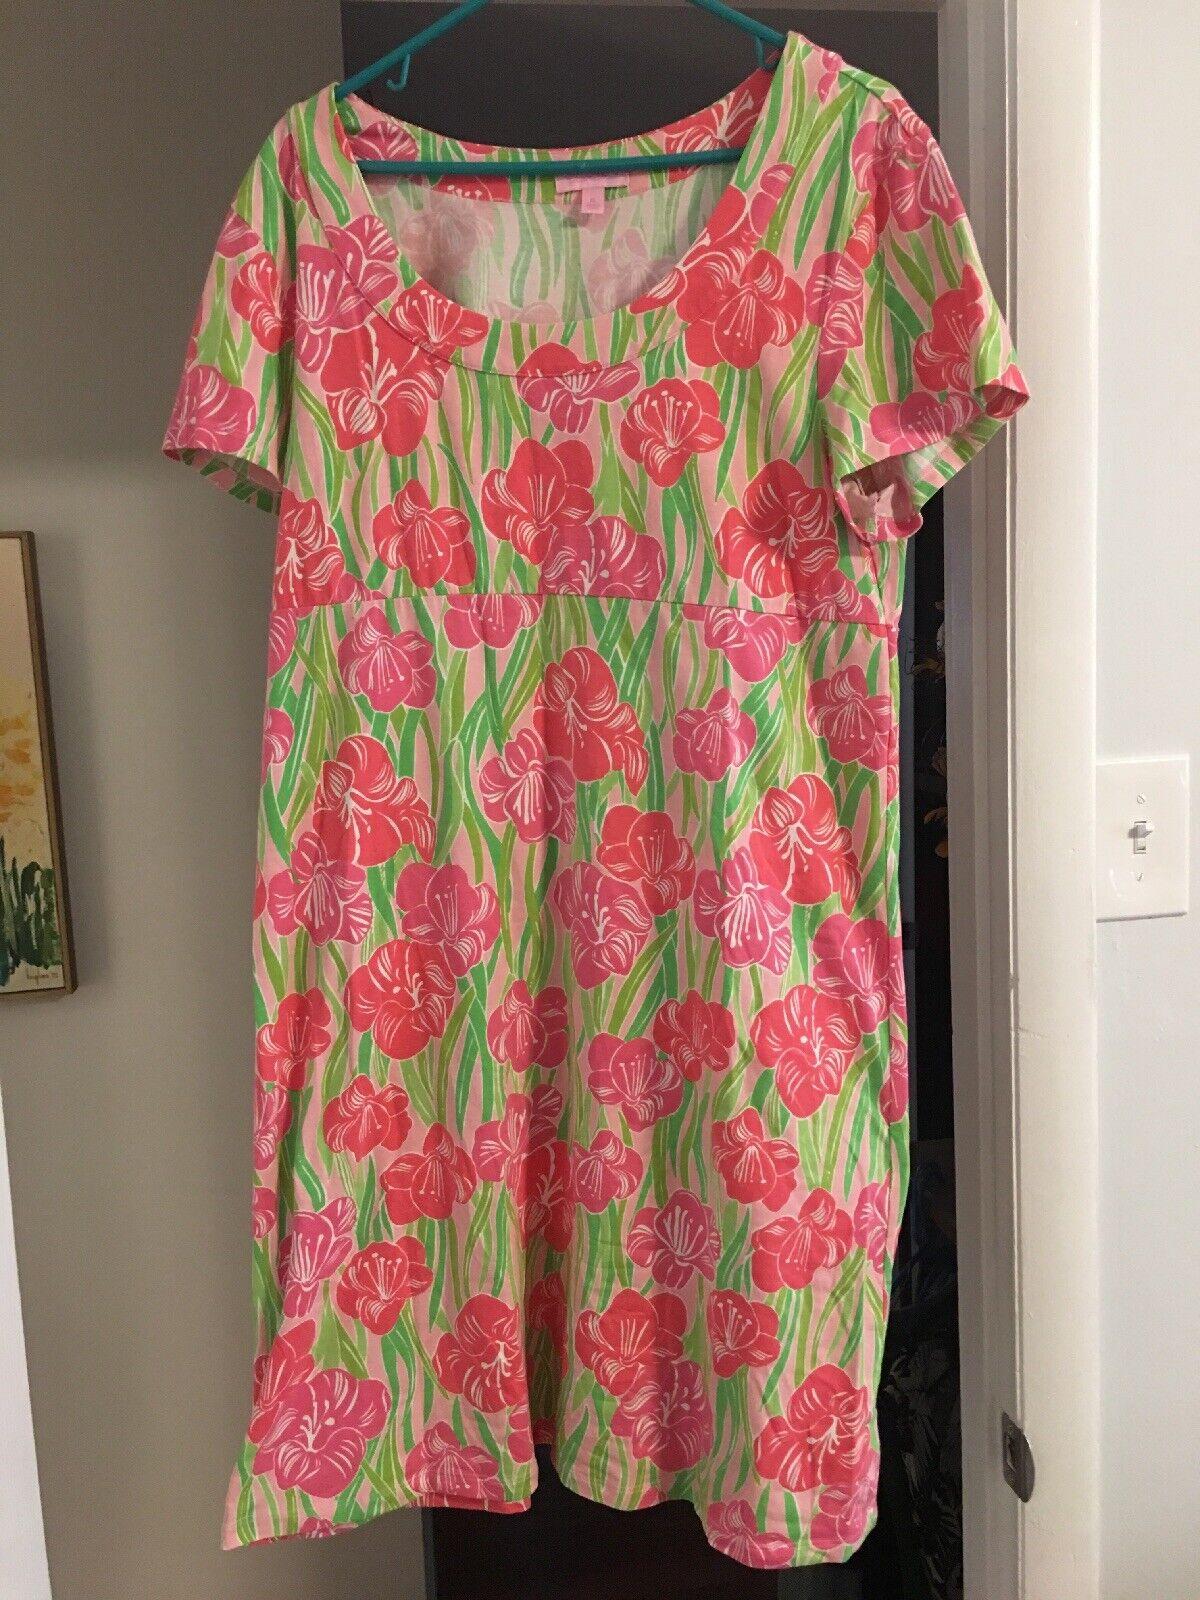 Lillly Pulitzer Dress Xl Rosa Grün Floral Short Sleeve Knee Length Dress